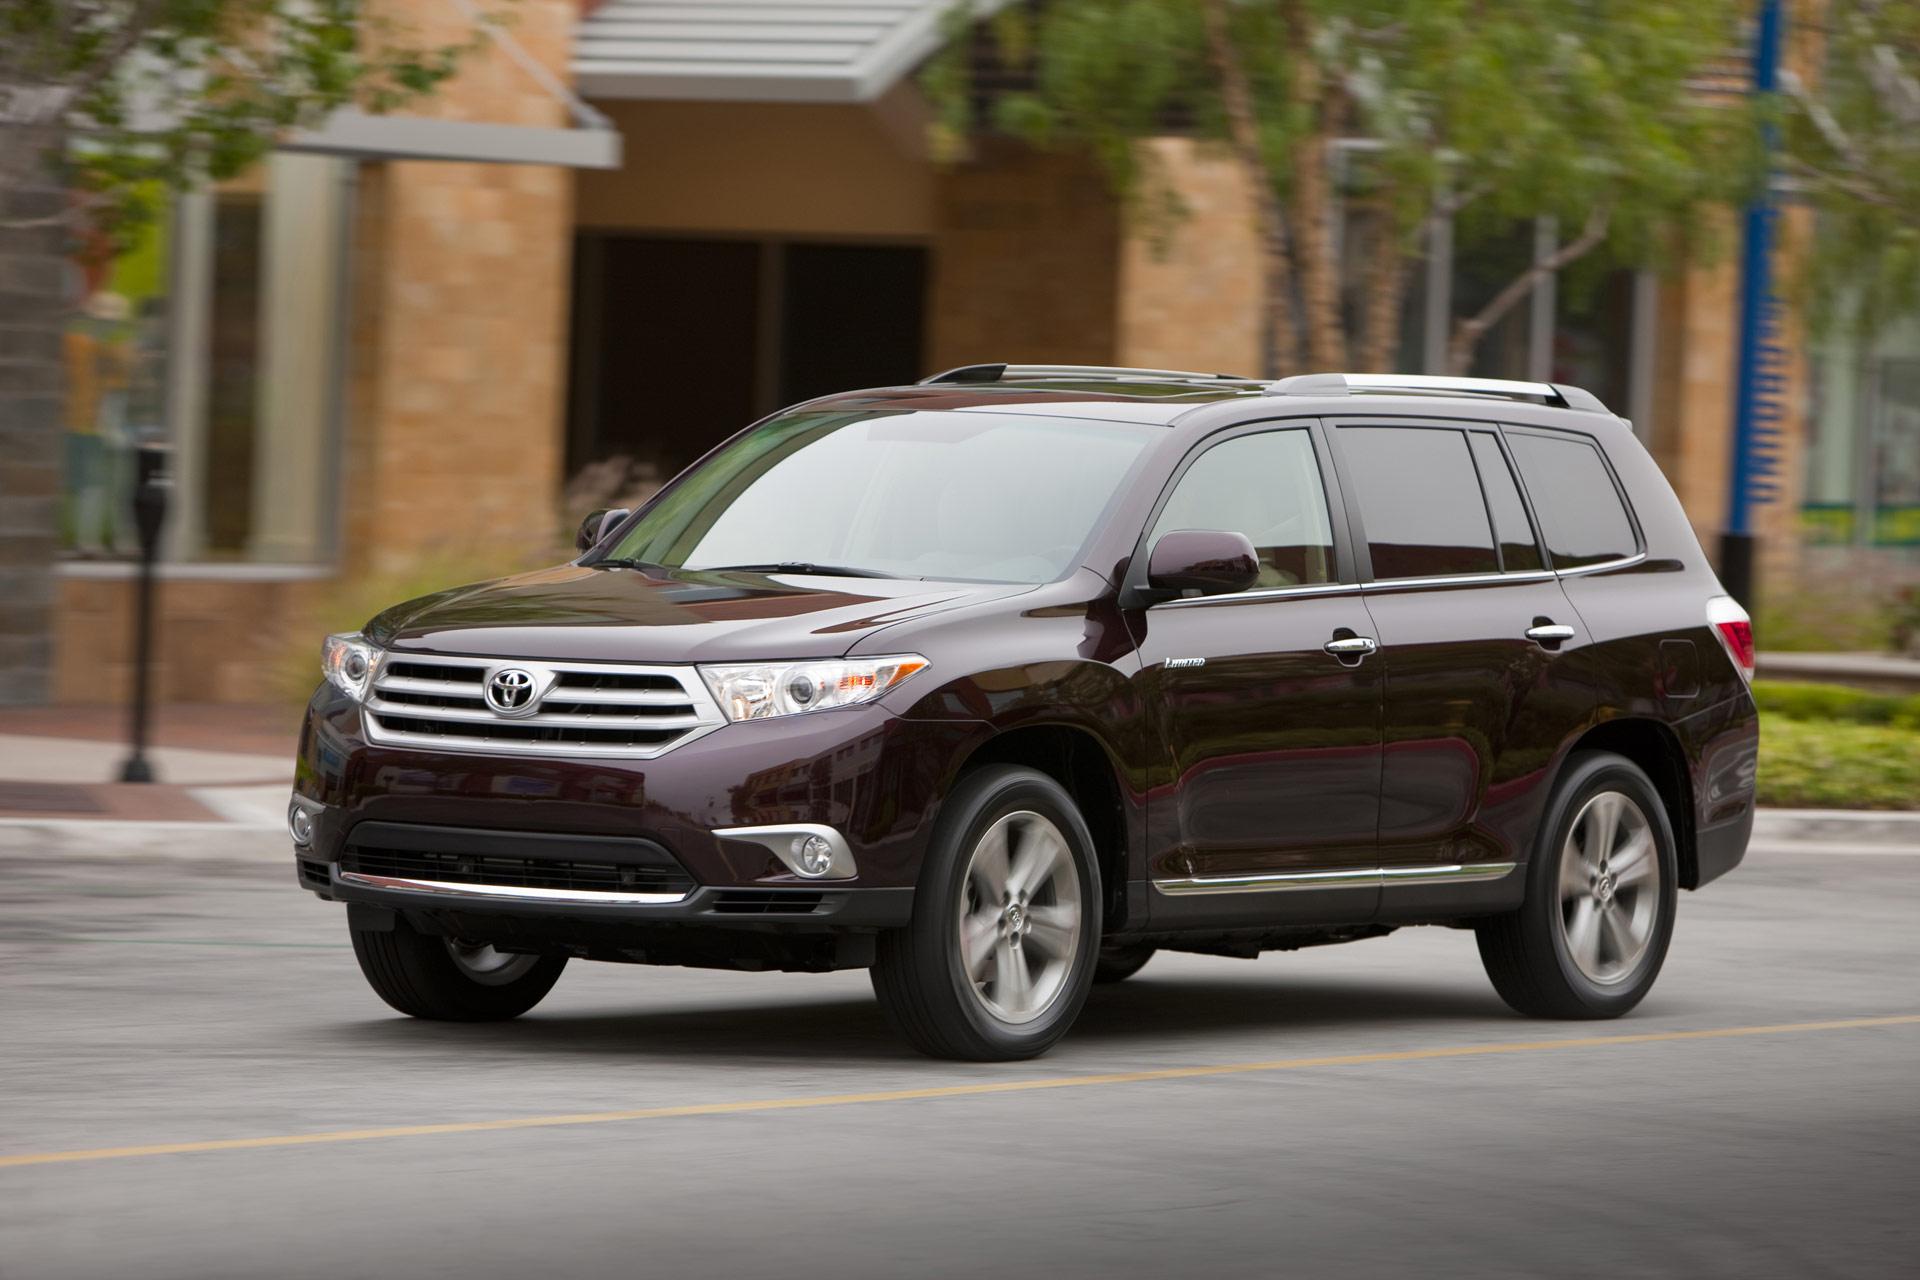 2013 Toyota Highlander News and Information